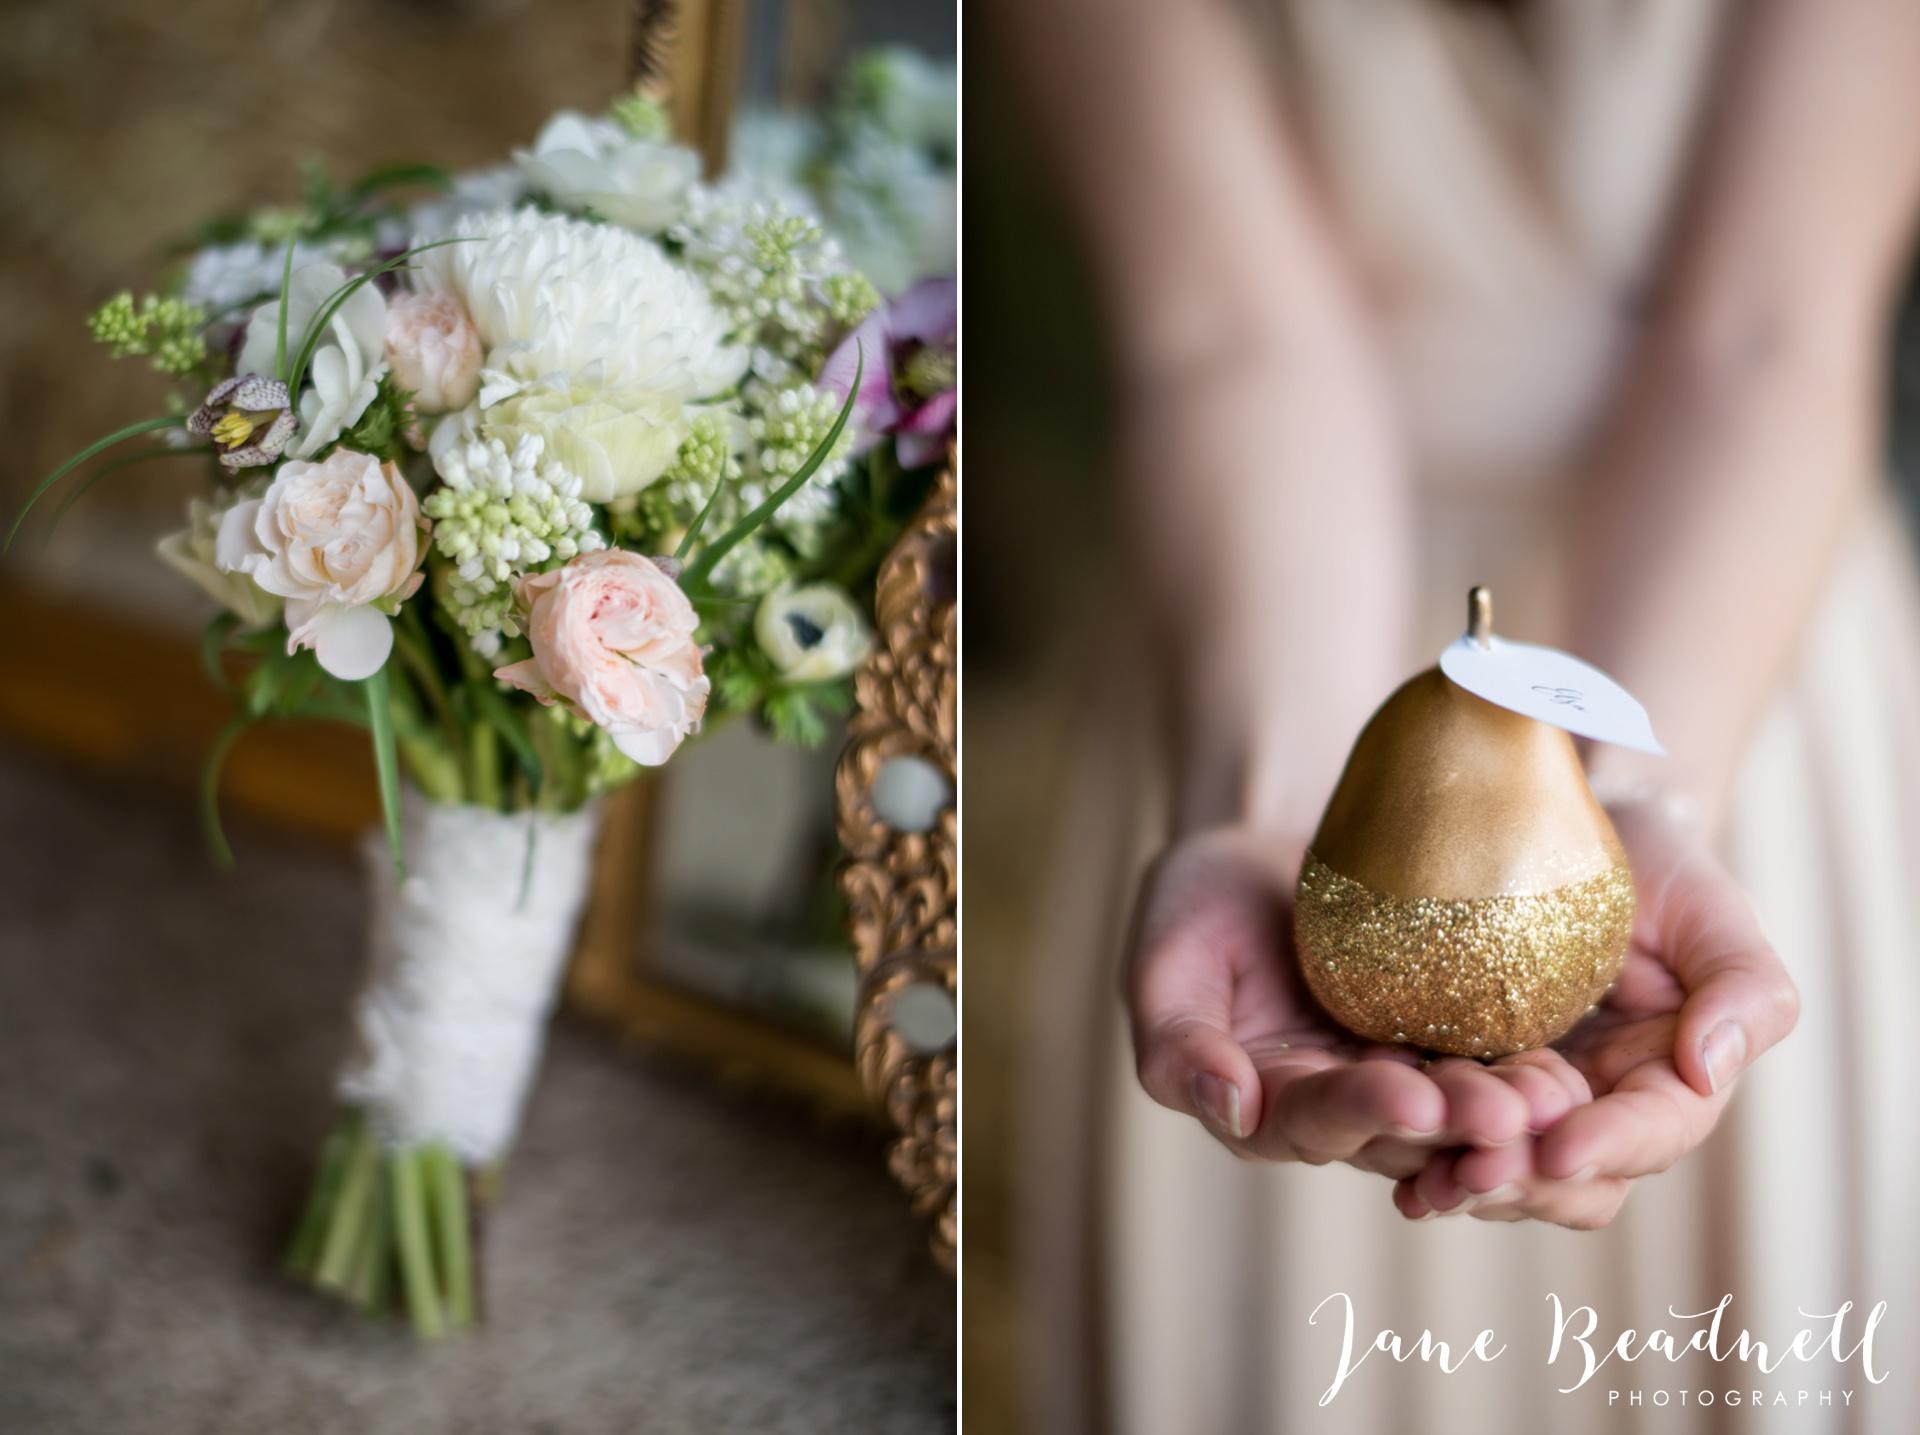 Jane Beadnell fine art wedding photographer Swinton Park22